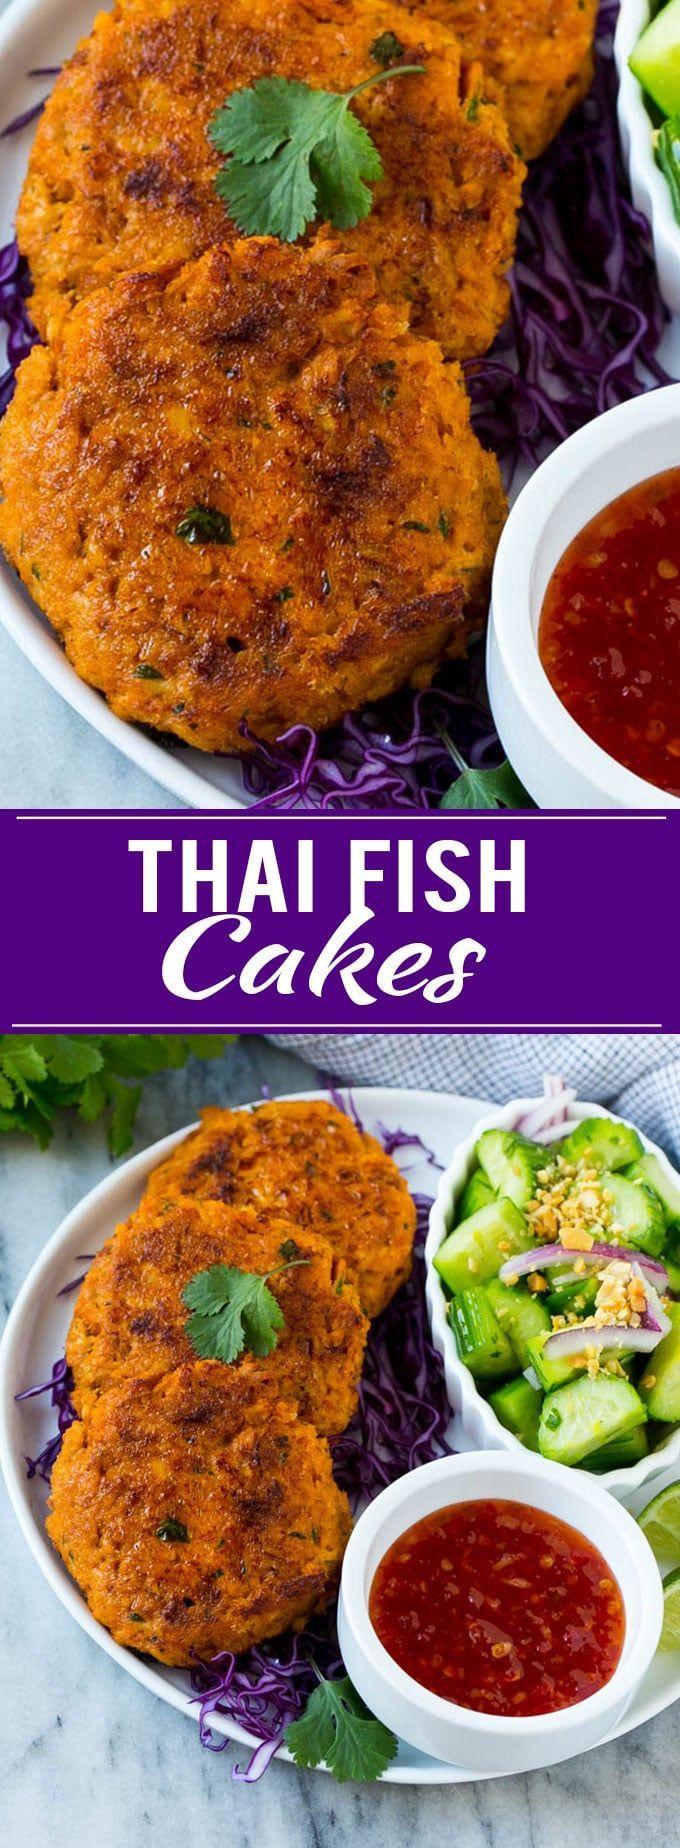 Thai Fish Cakes   Salmon Patties   Thai Food